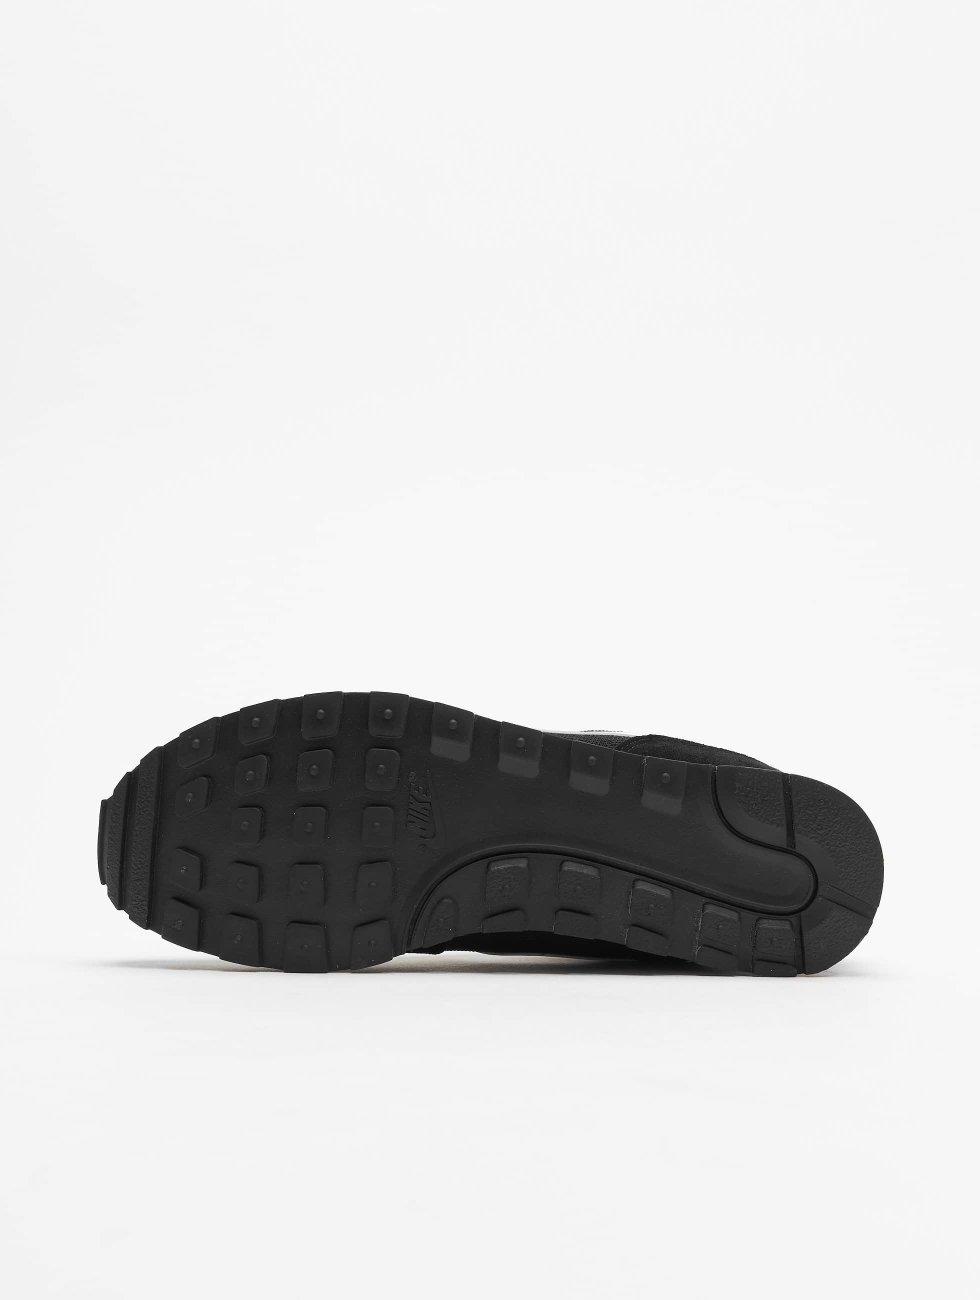 Nike Scarpa / Sneaker Md 2 Corridore In Nero 234 697 kj2Mzlgf